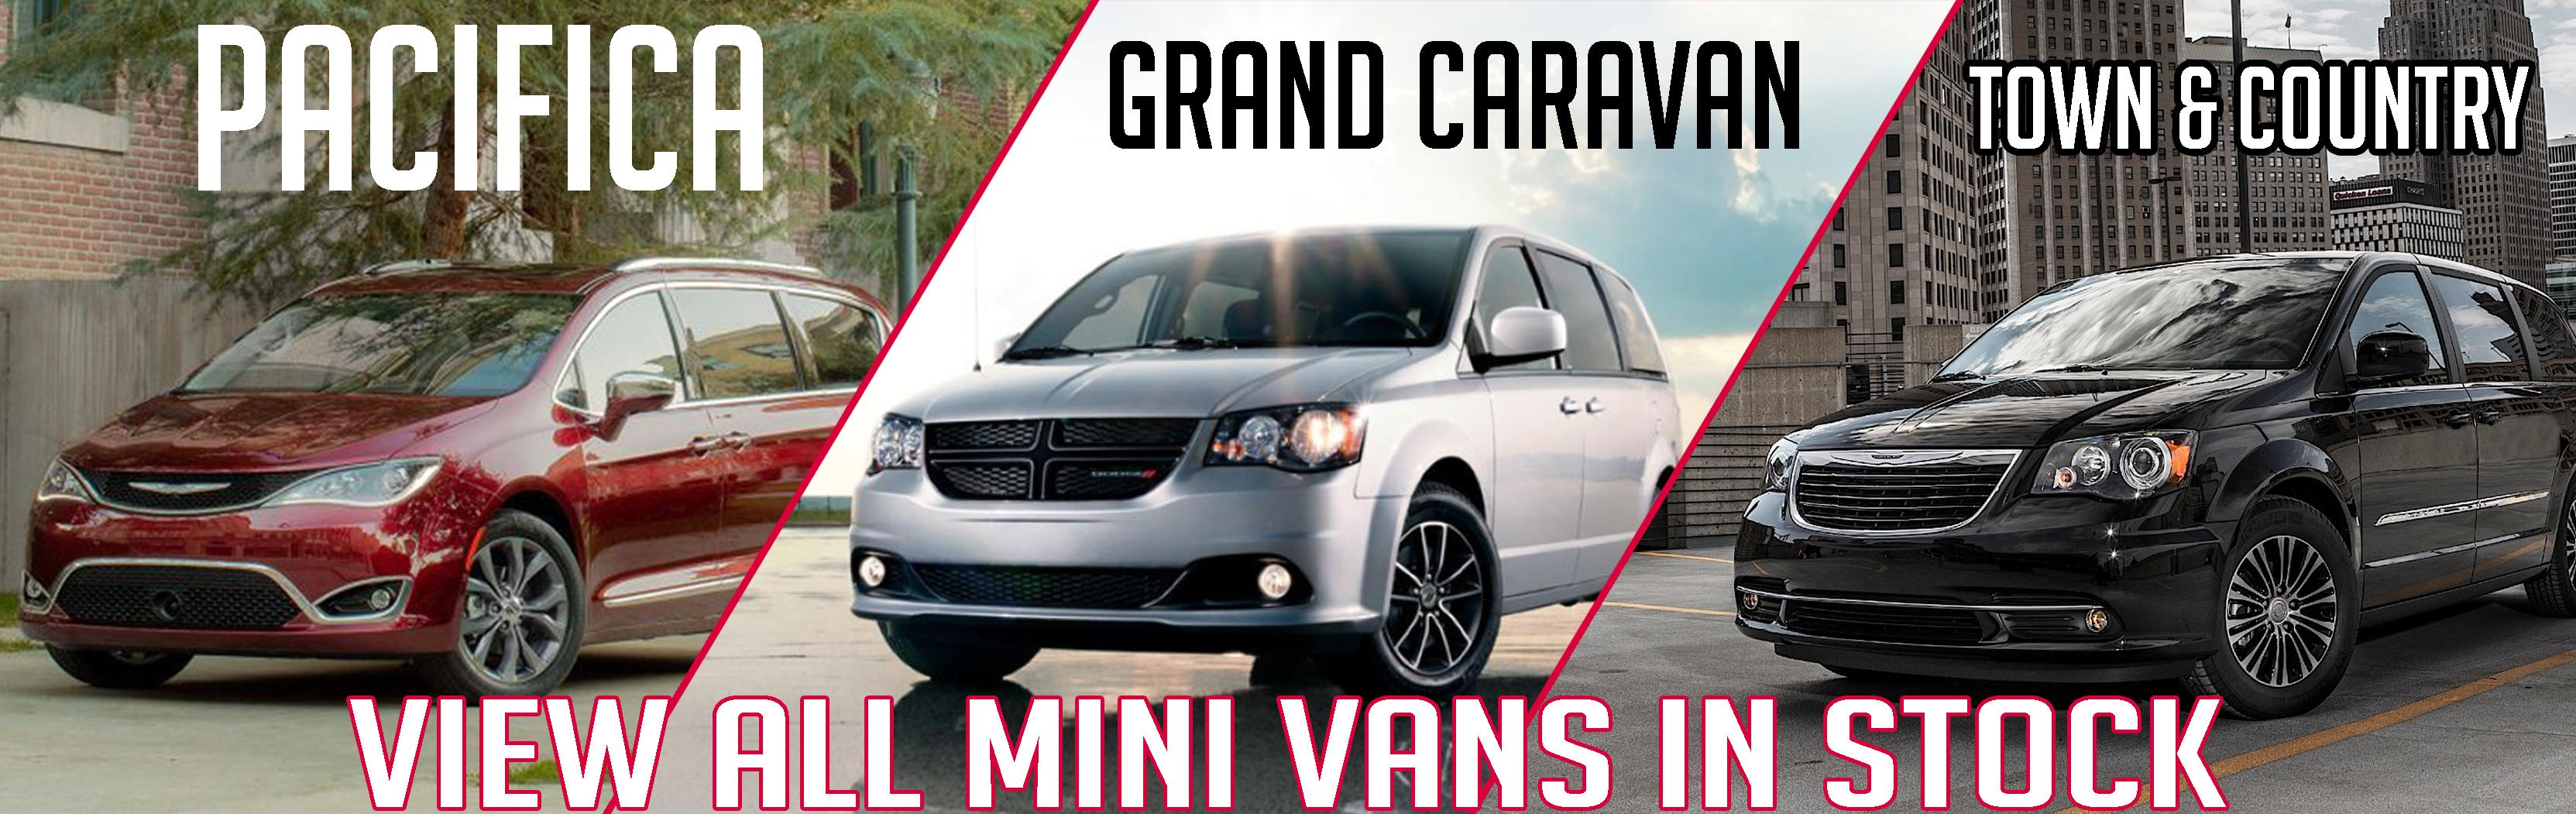 New Minivan Specials in Maquoketa Iowa